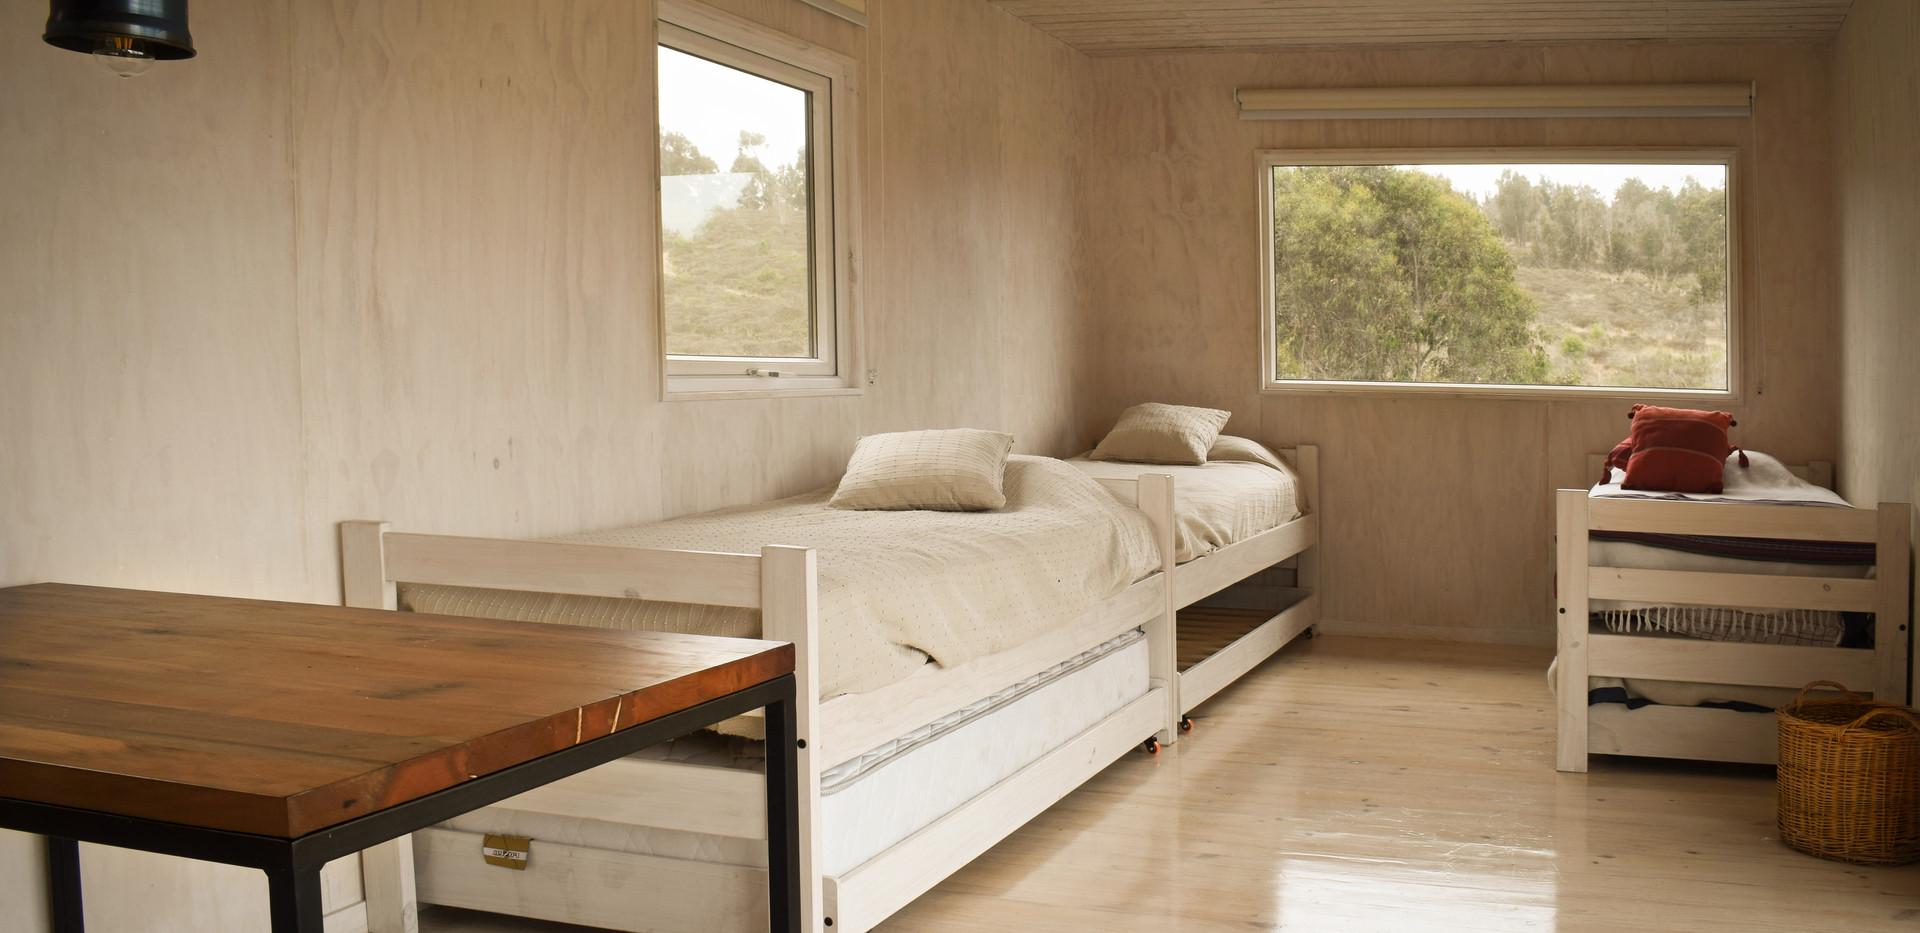 Interior dormitorio.